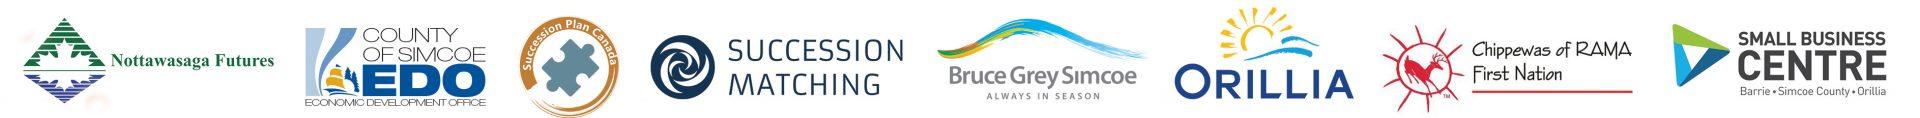 BTMP Sponsors 1 - Business Transition Matching Program